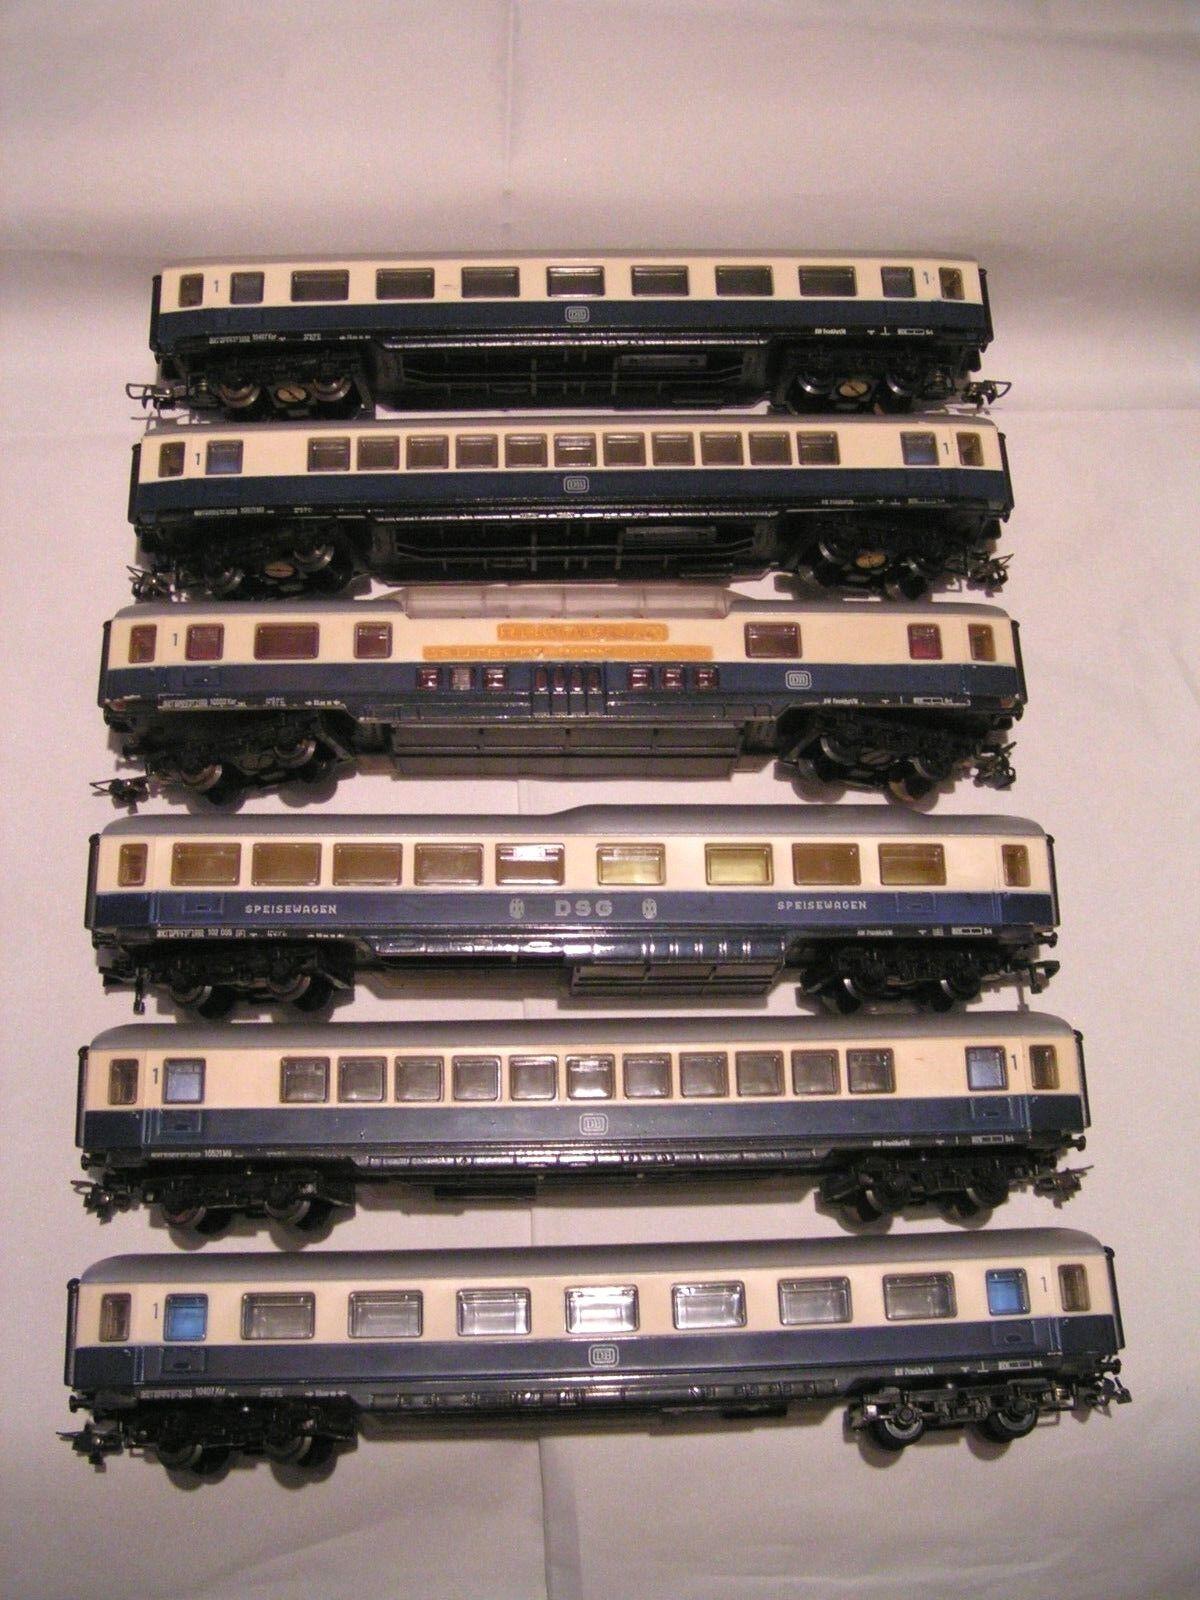 MECCANO   HORNBY AchO 1 87 - 2 rails  -  RAME DE VOITURES RHEINoro (6 PIECES)